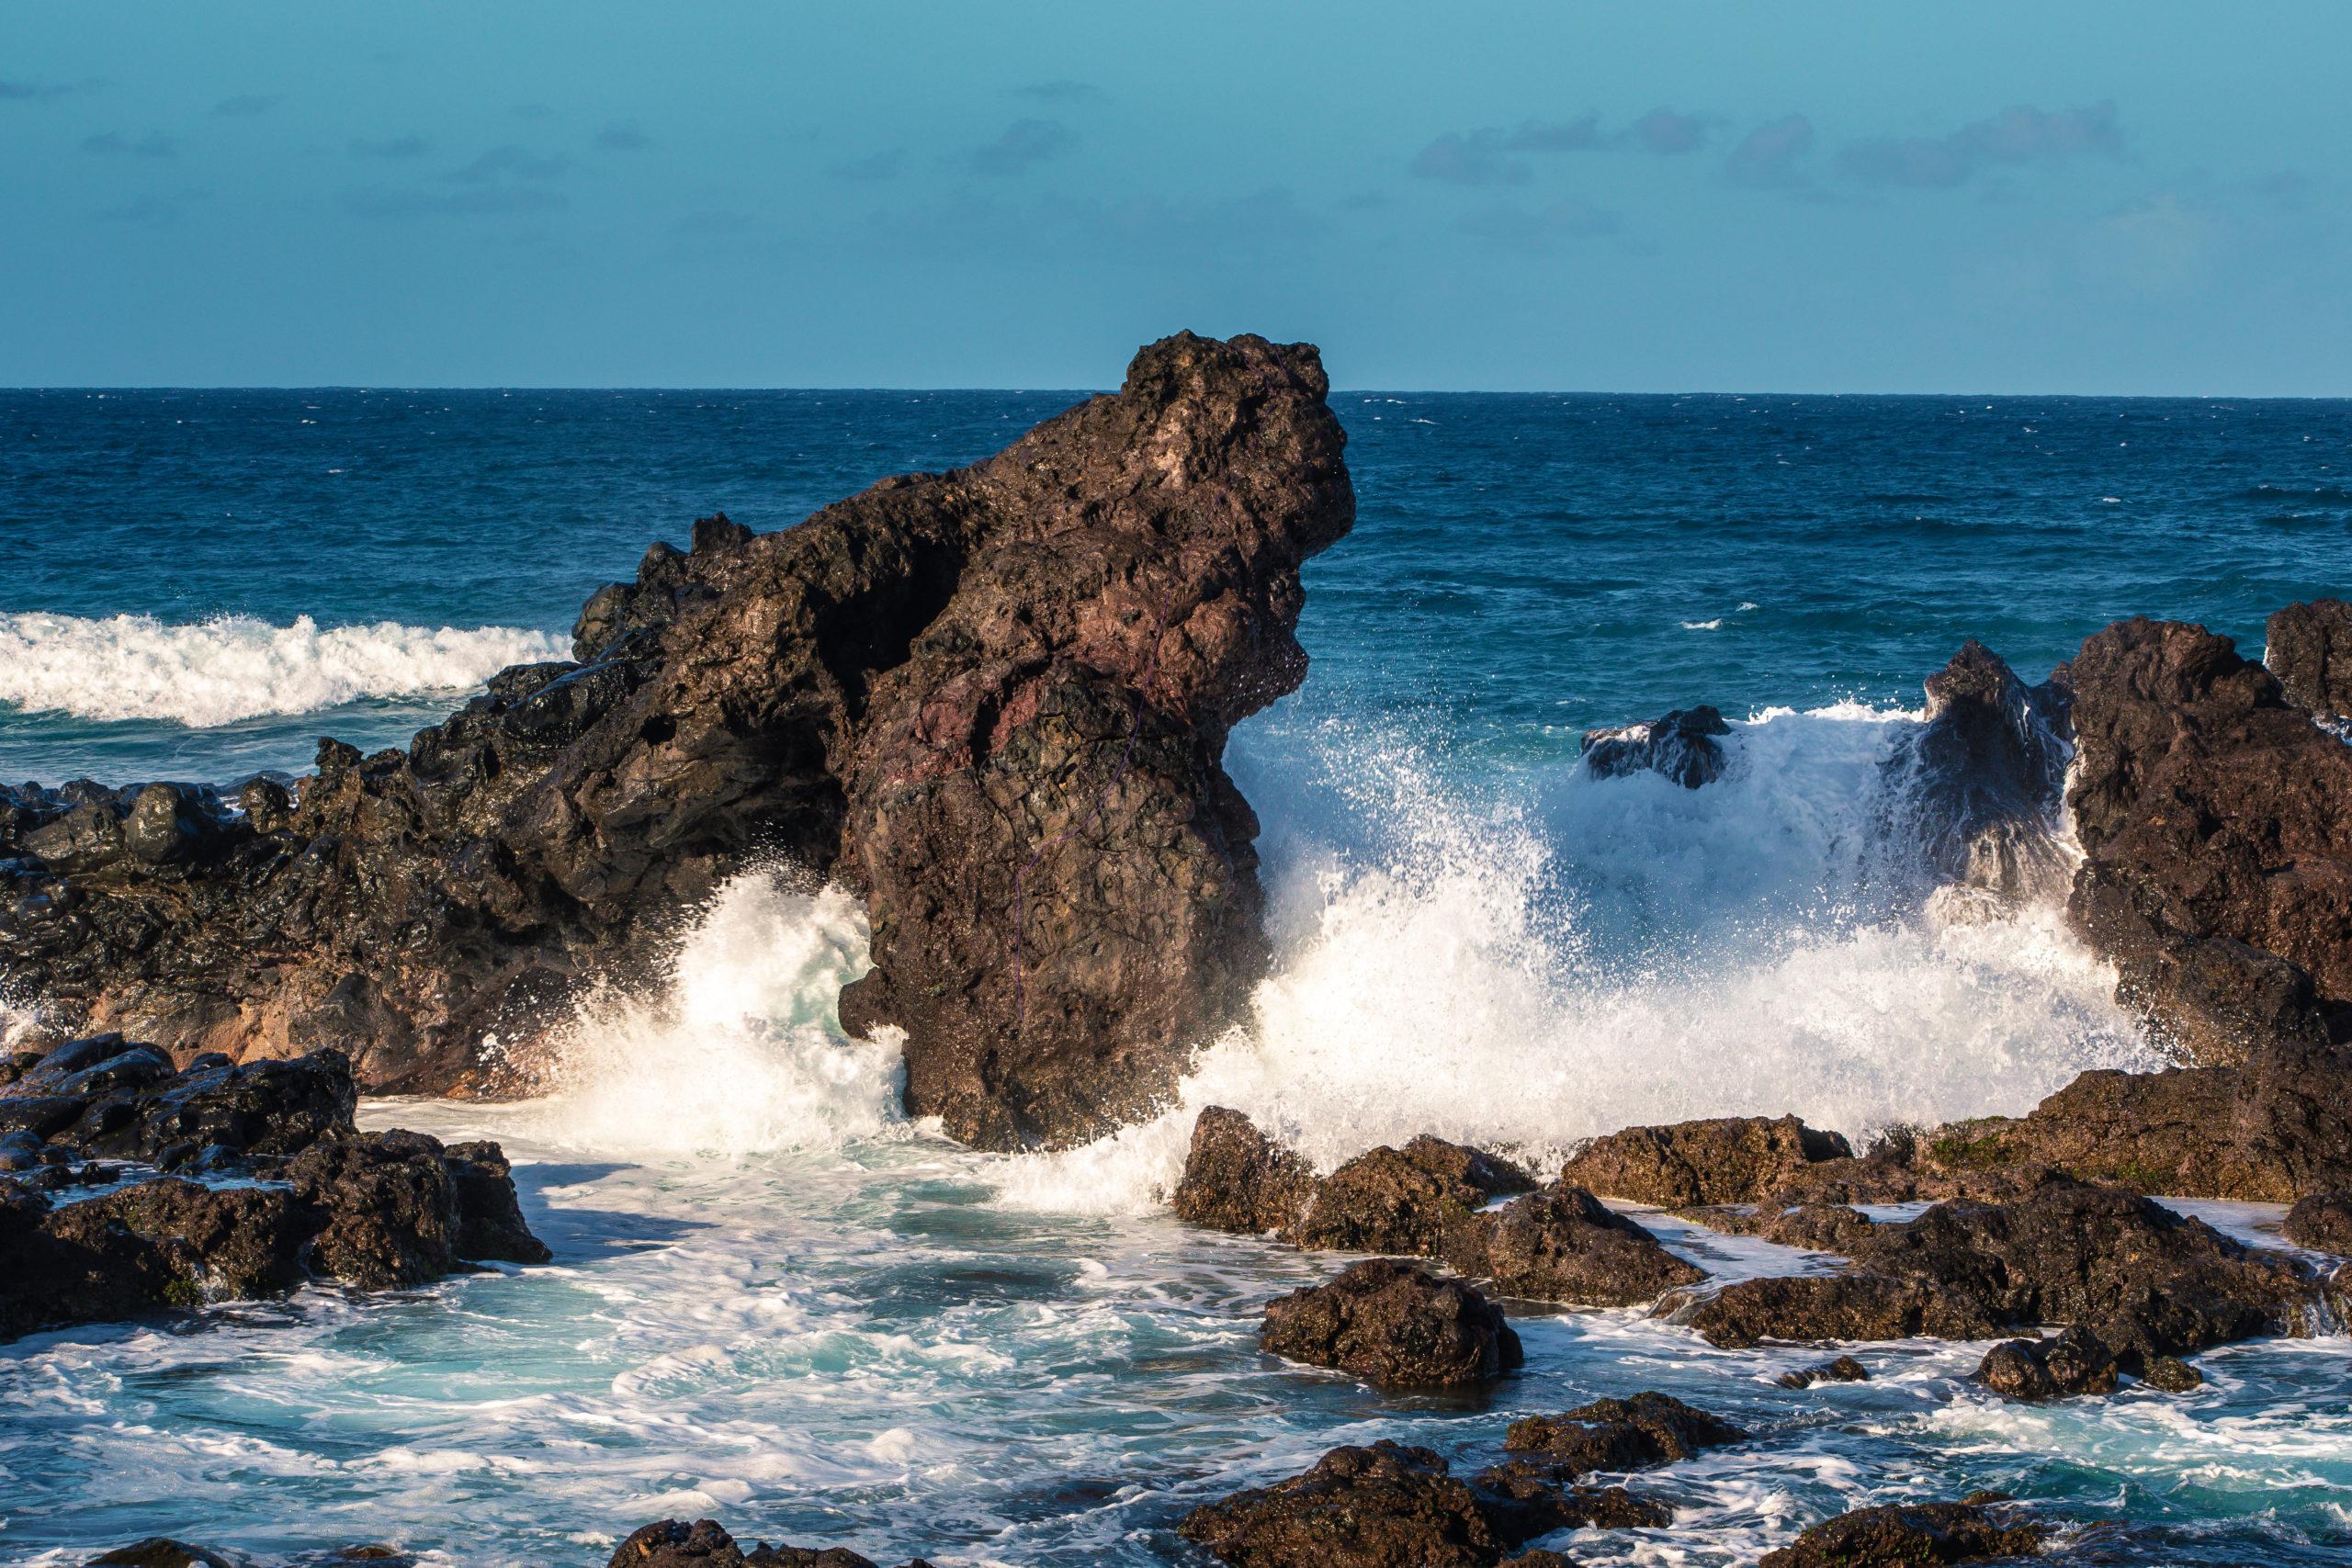 Crashing Waves, by John Monarch